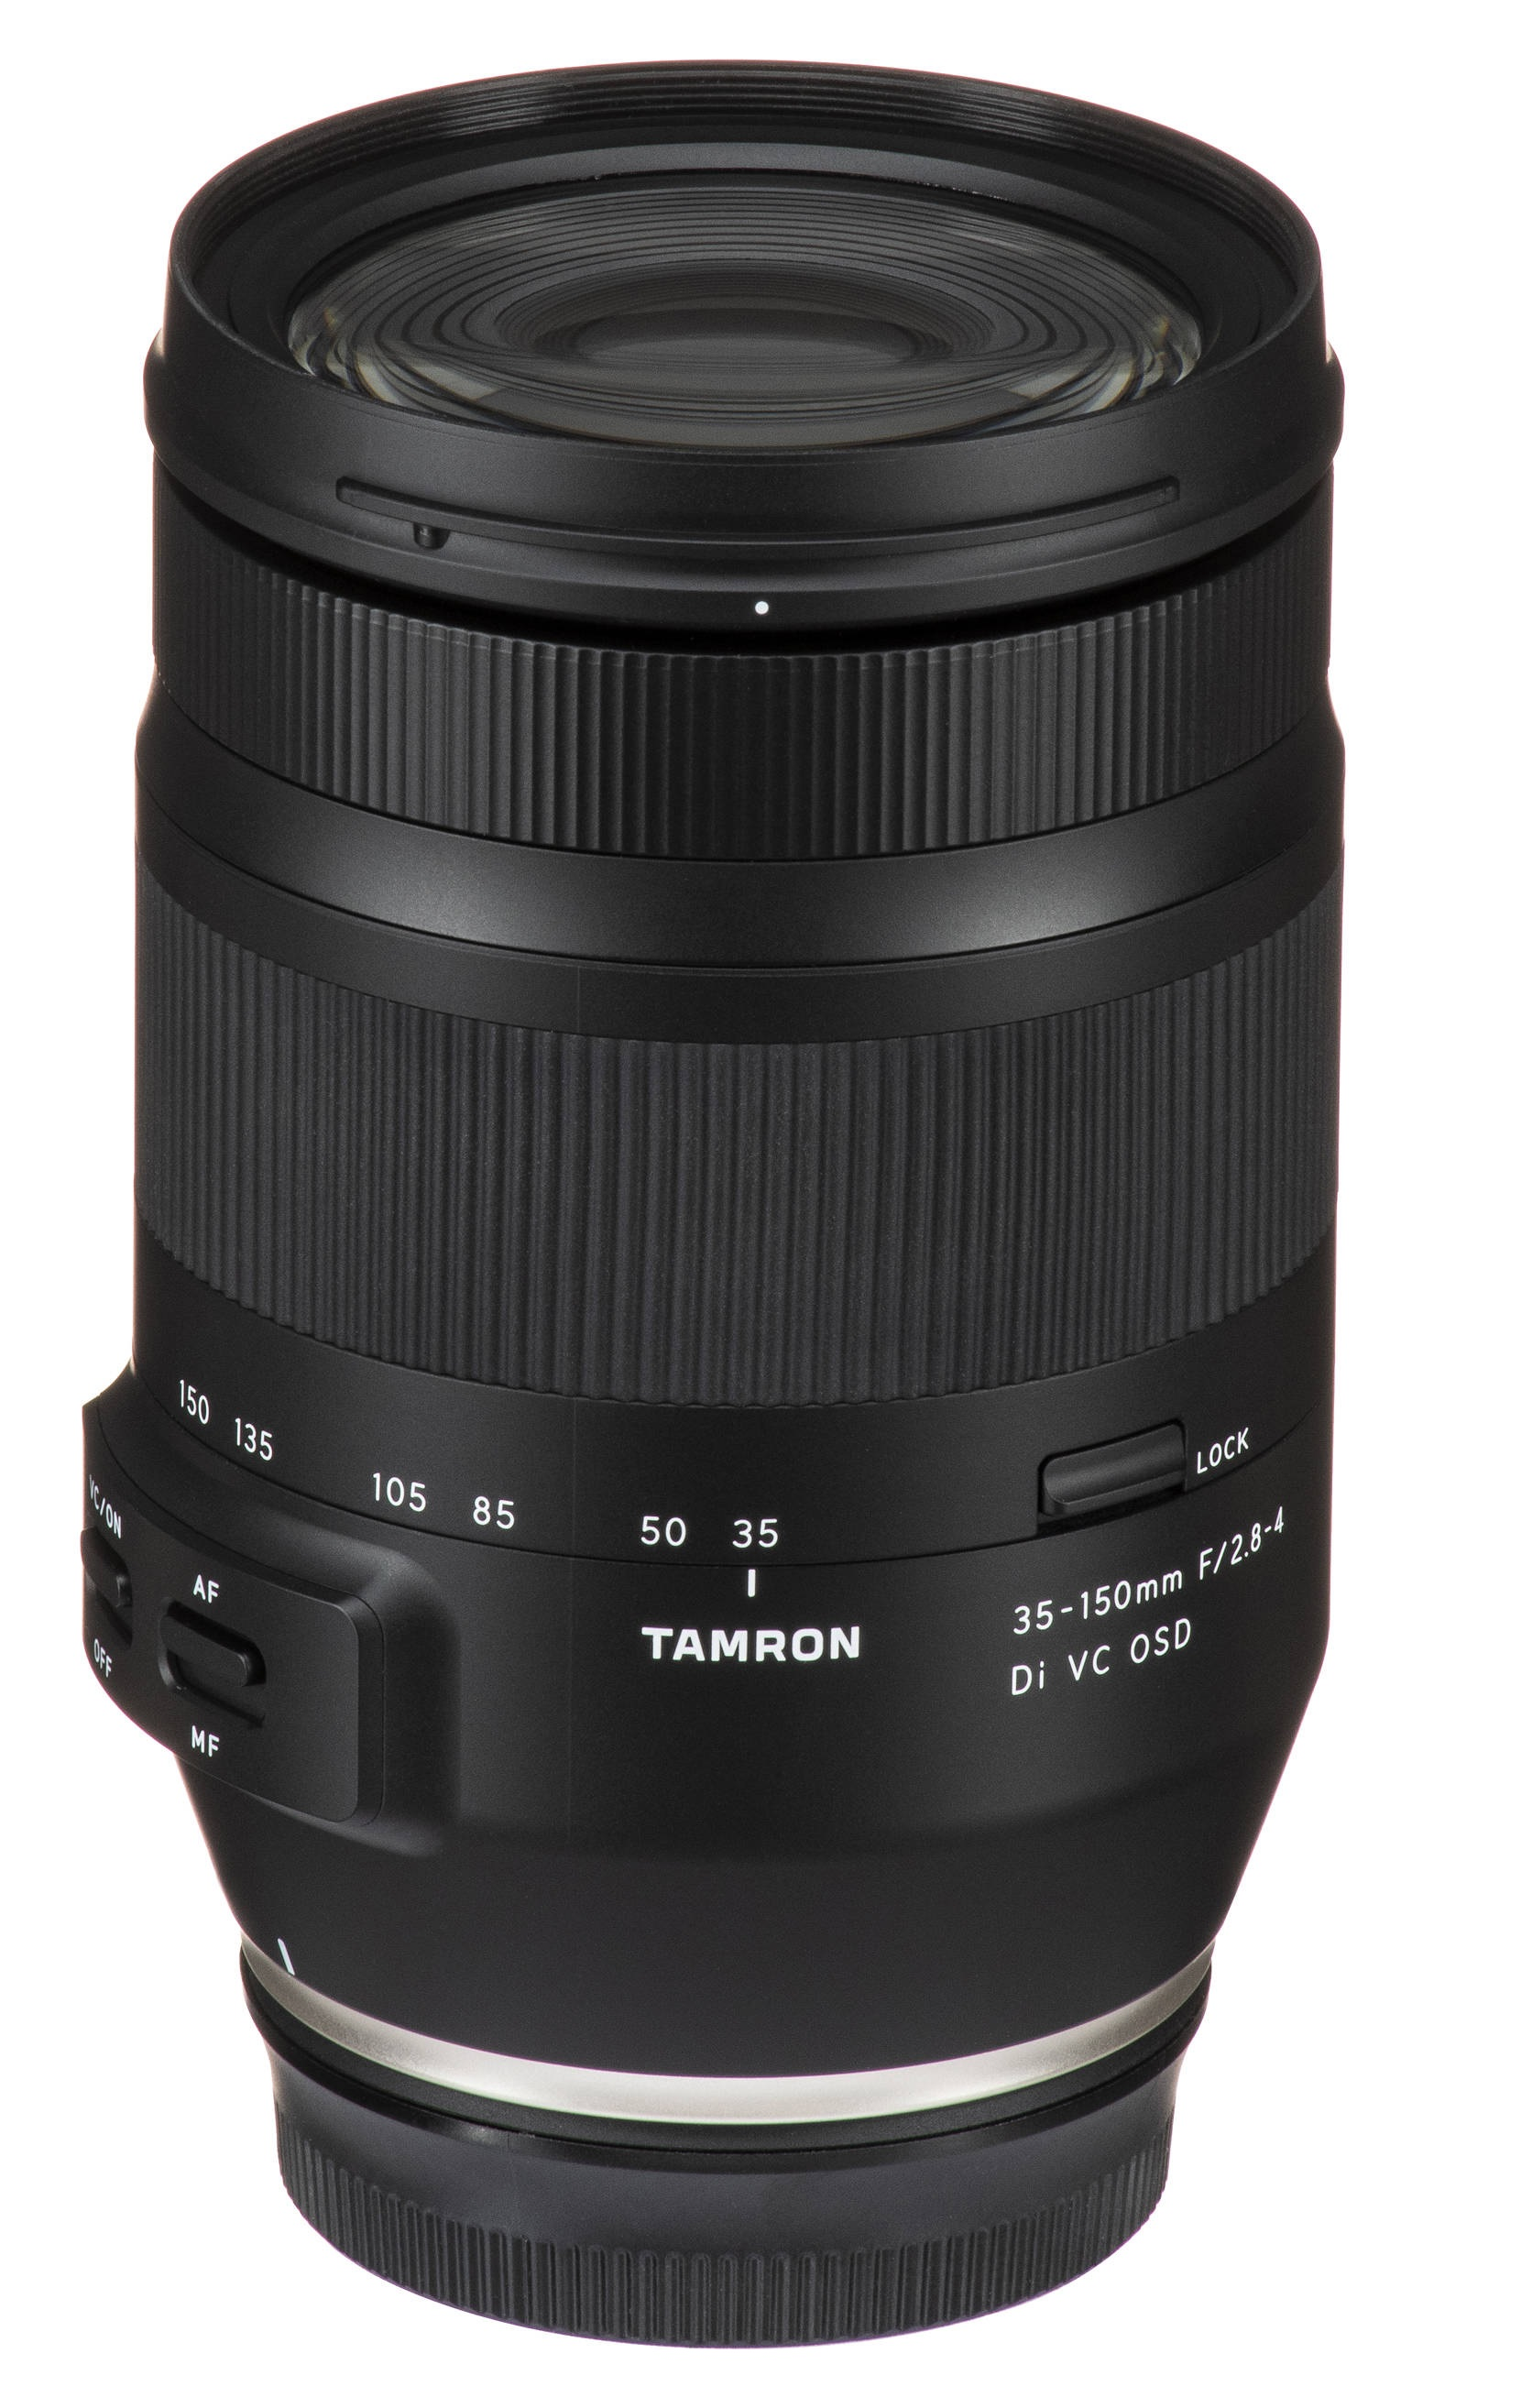 Tamron AF 35-150mm F2.8-4 Di VC OSD Camera Lens